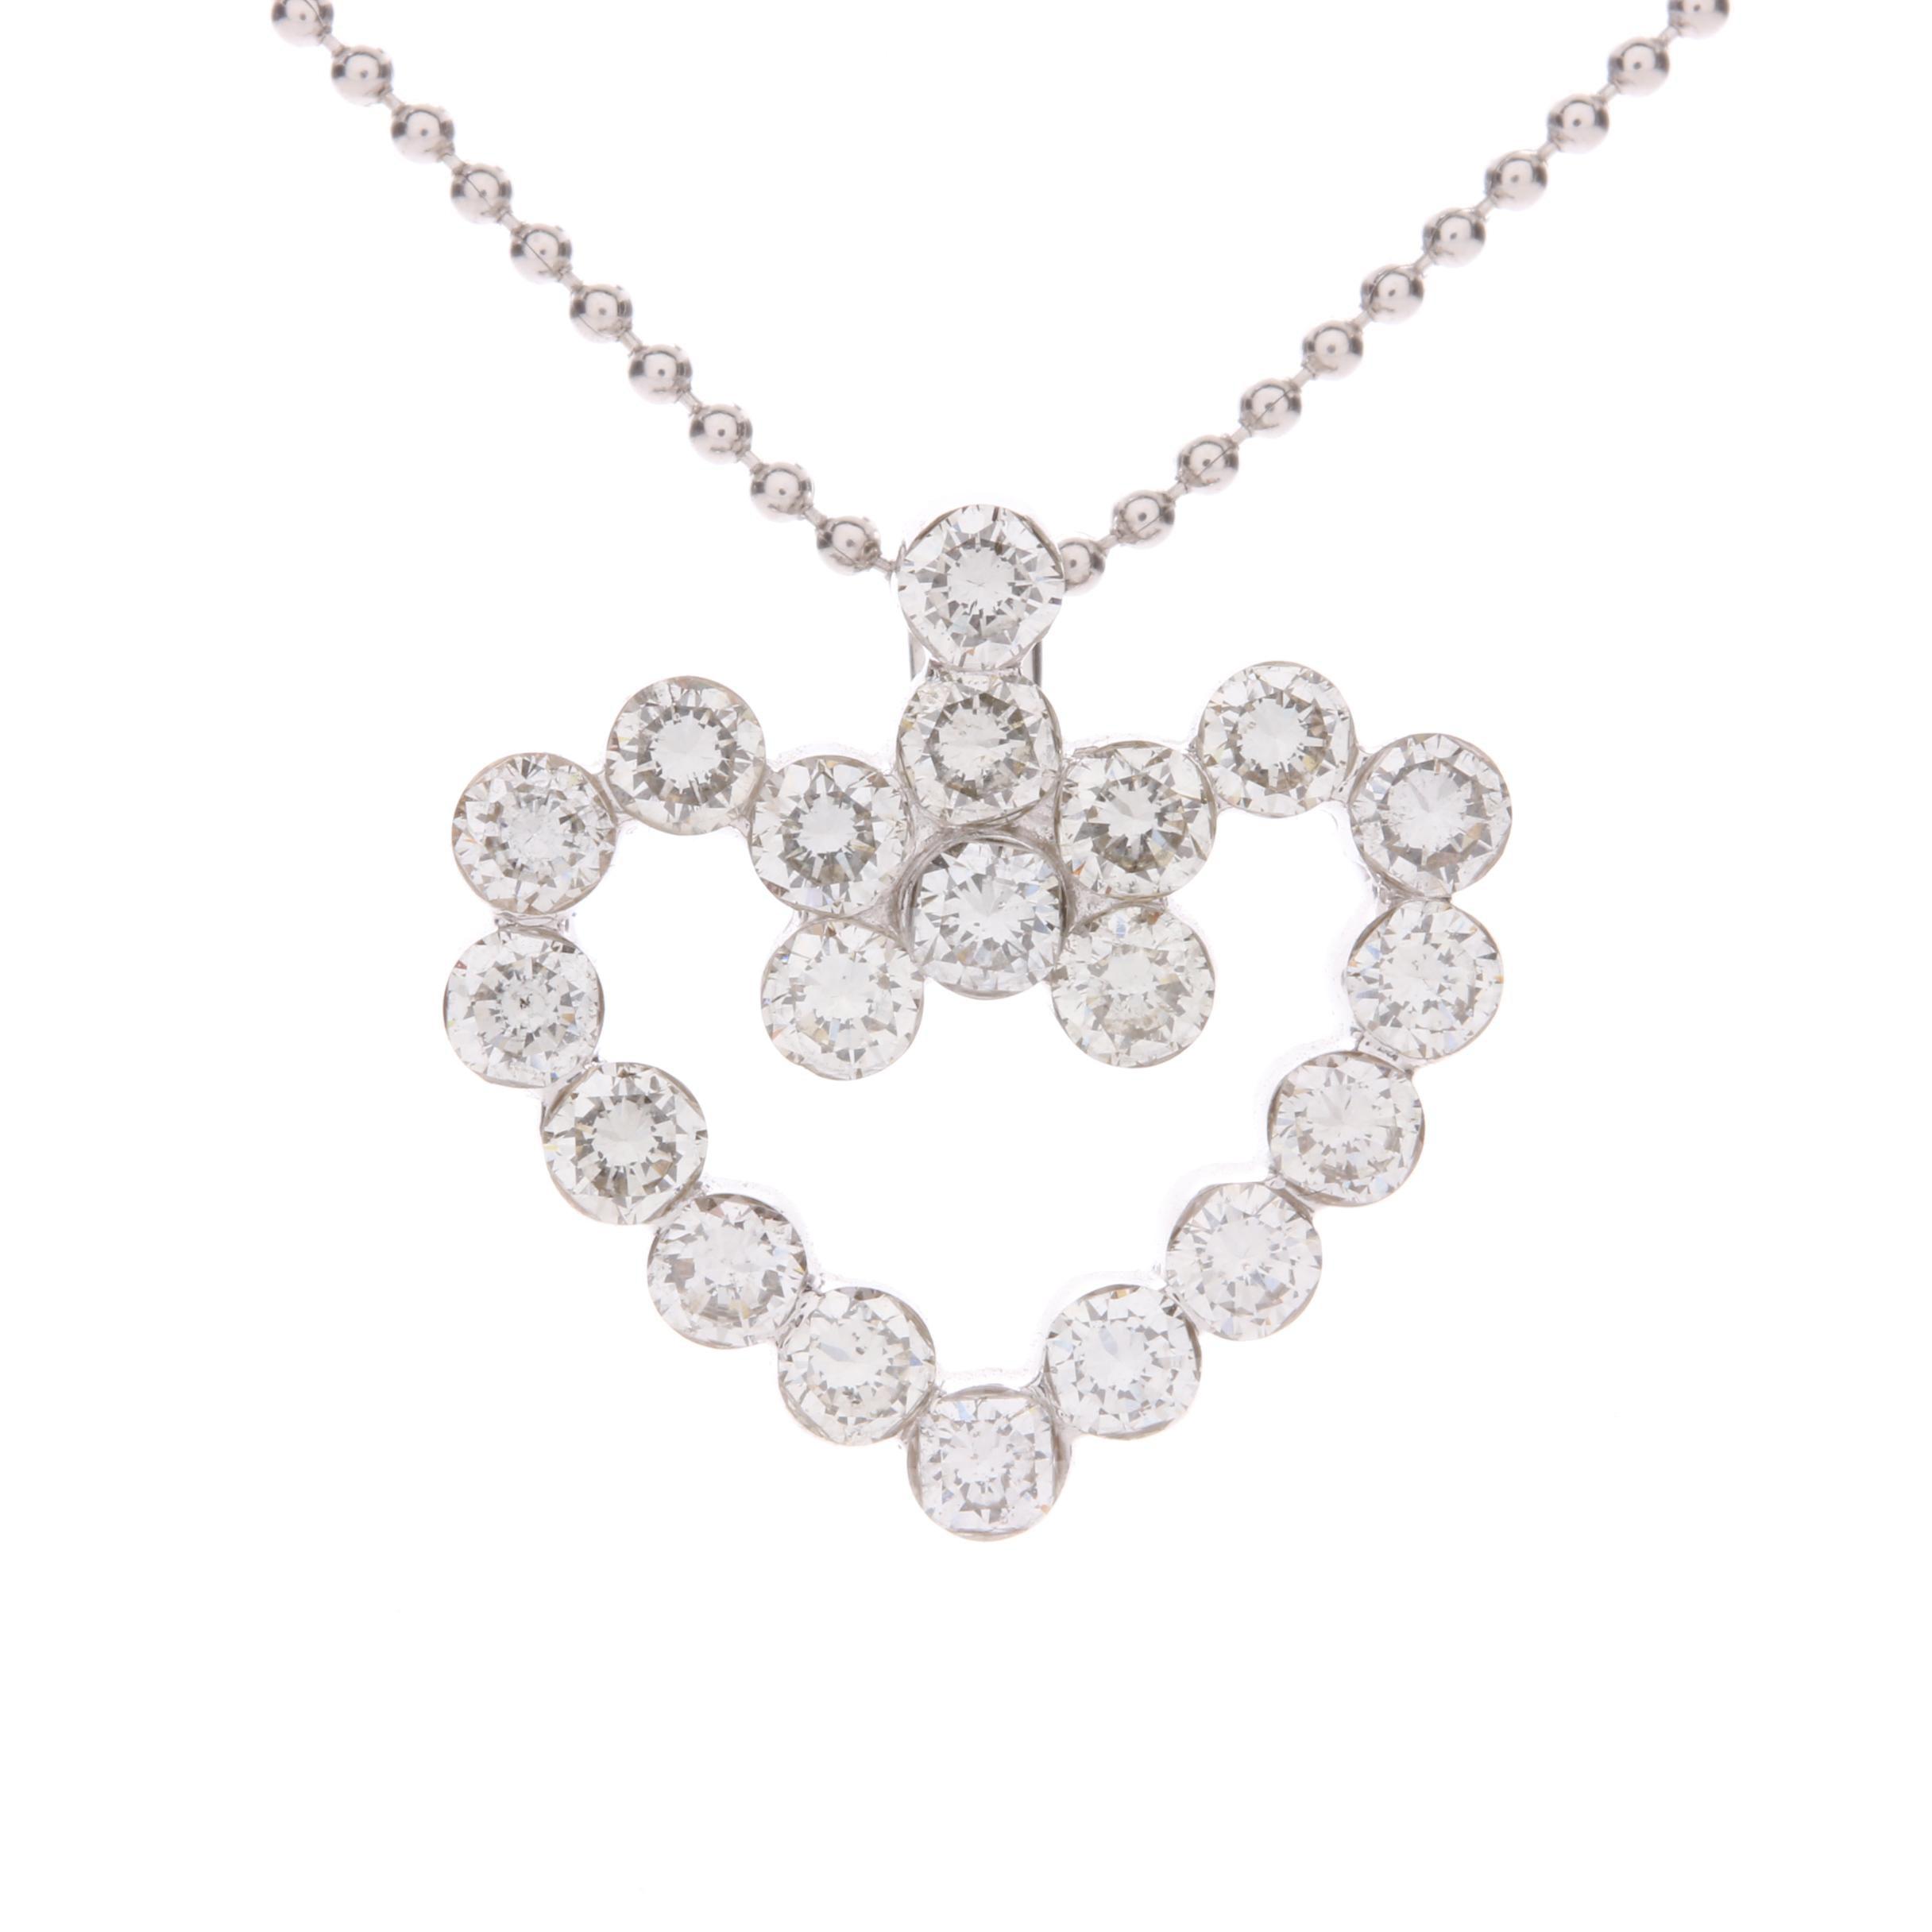 14K White Gold 1.25 CTW Diamond Heart Pendant Necklace